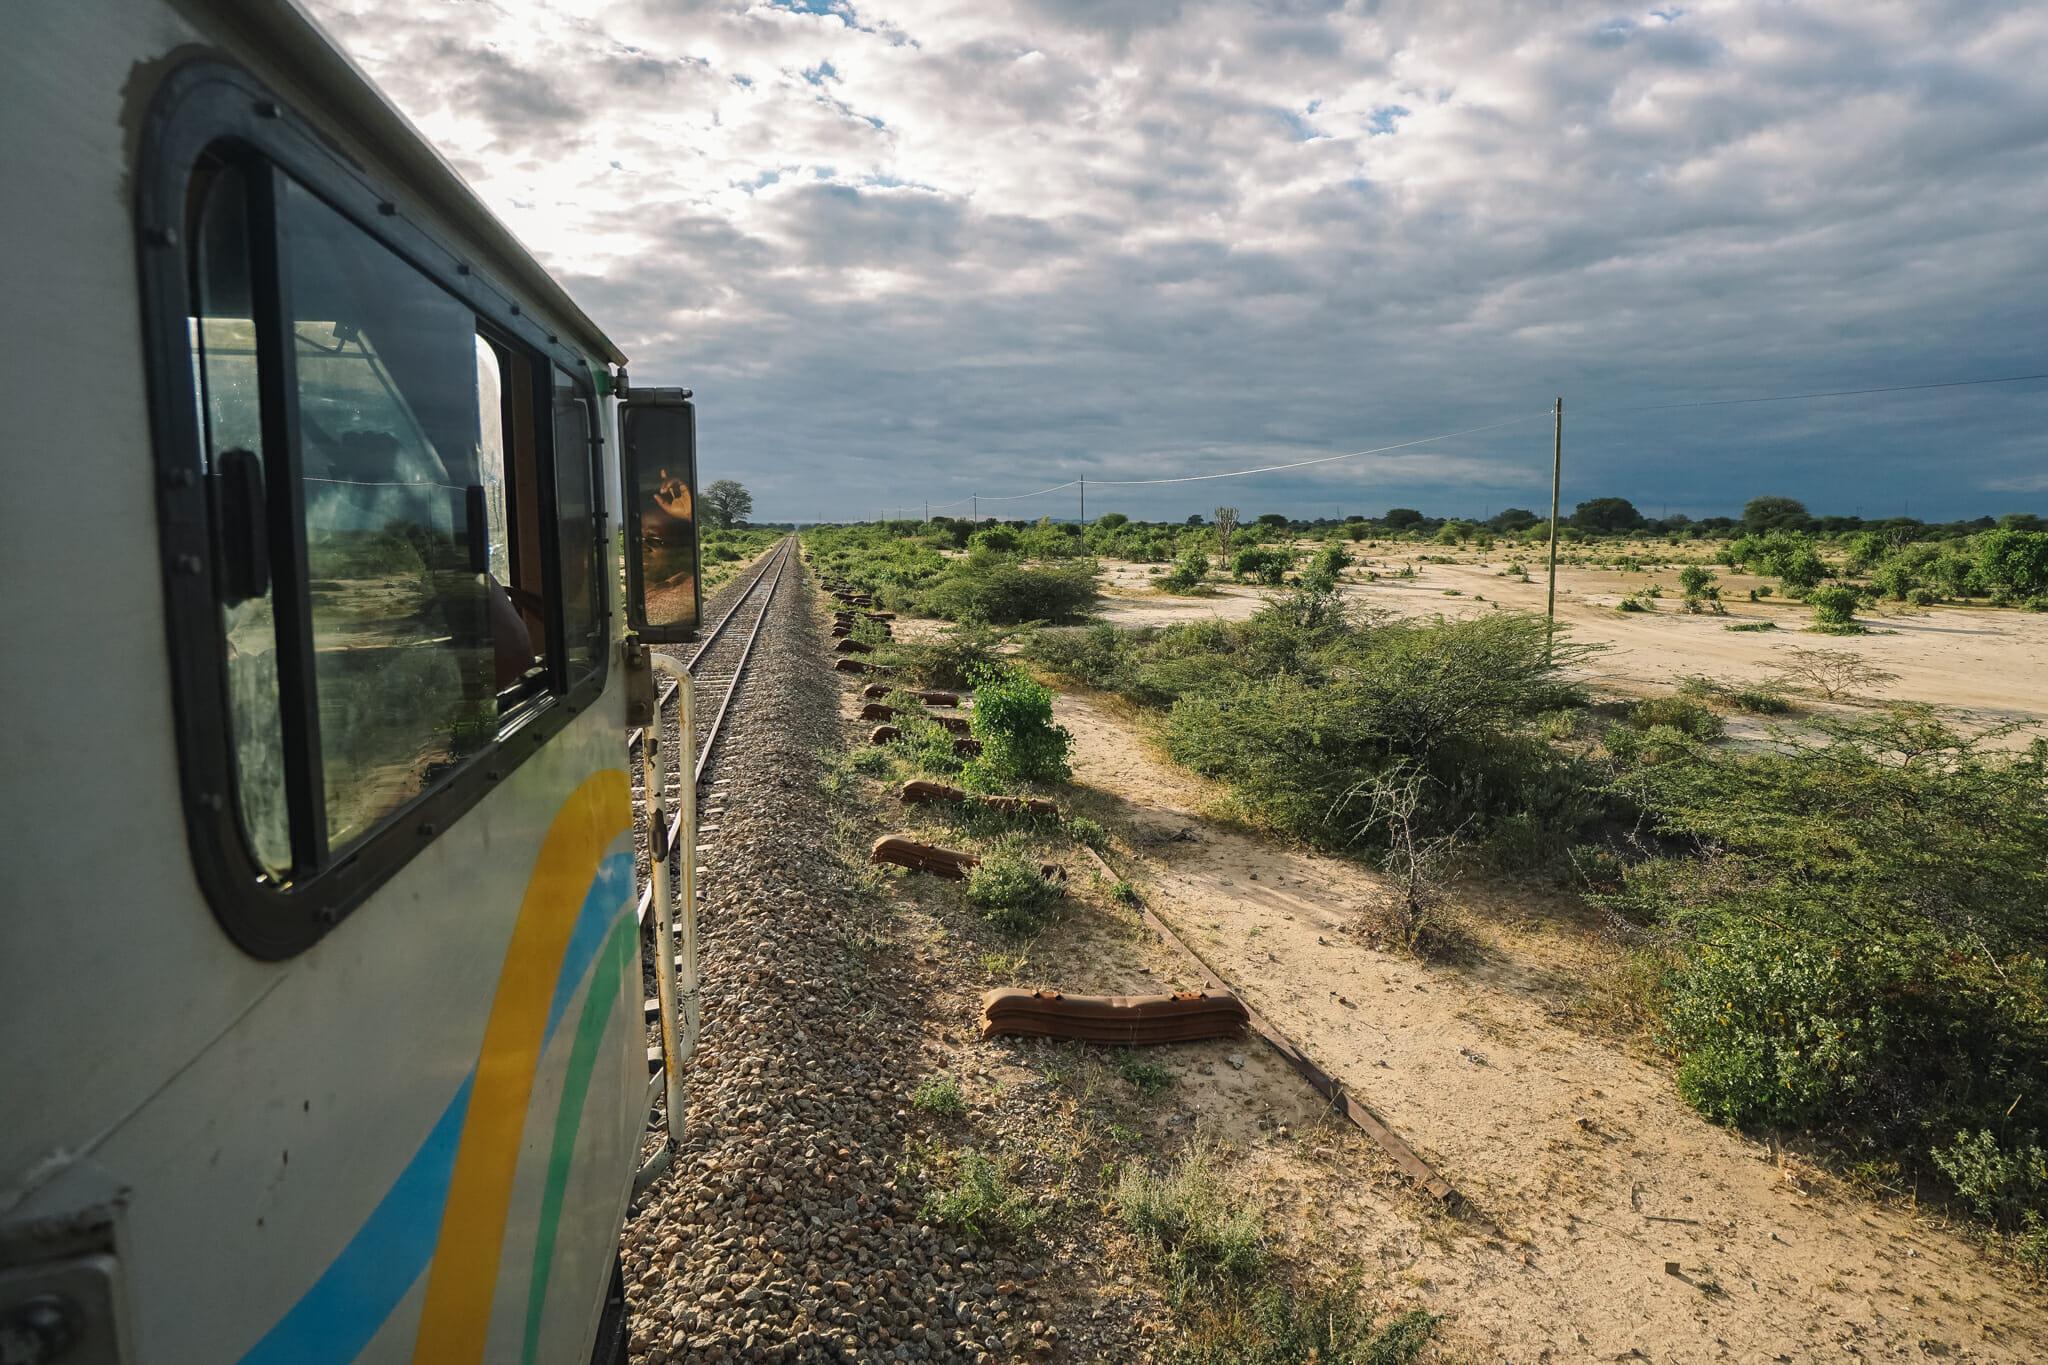 voyage-tanzanie-train-locomotive